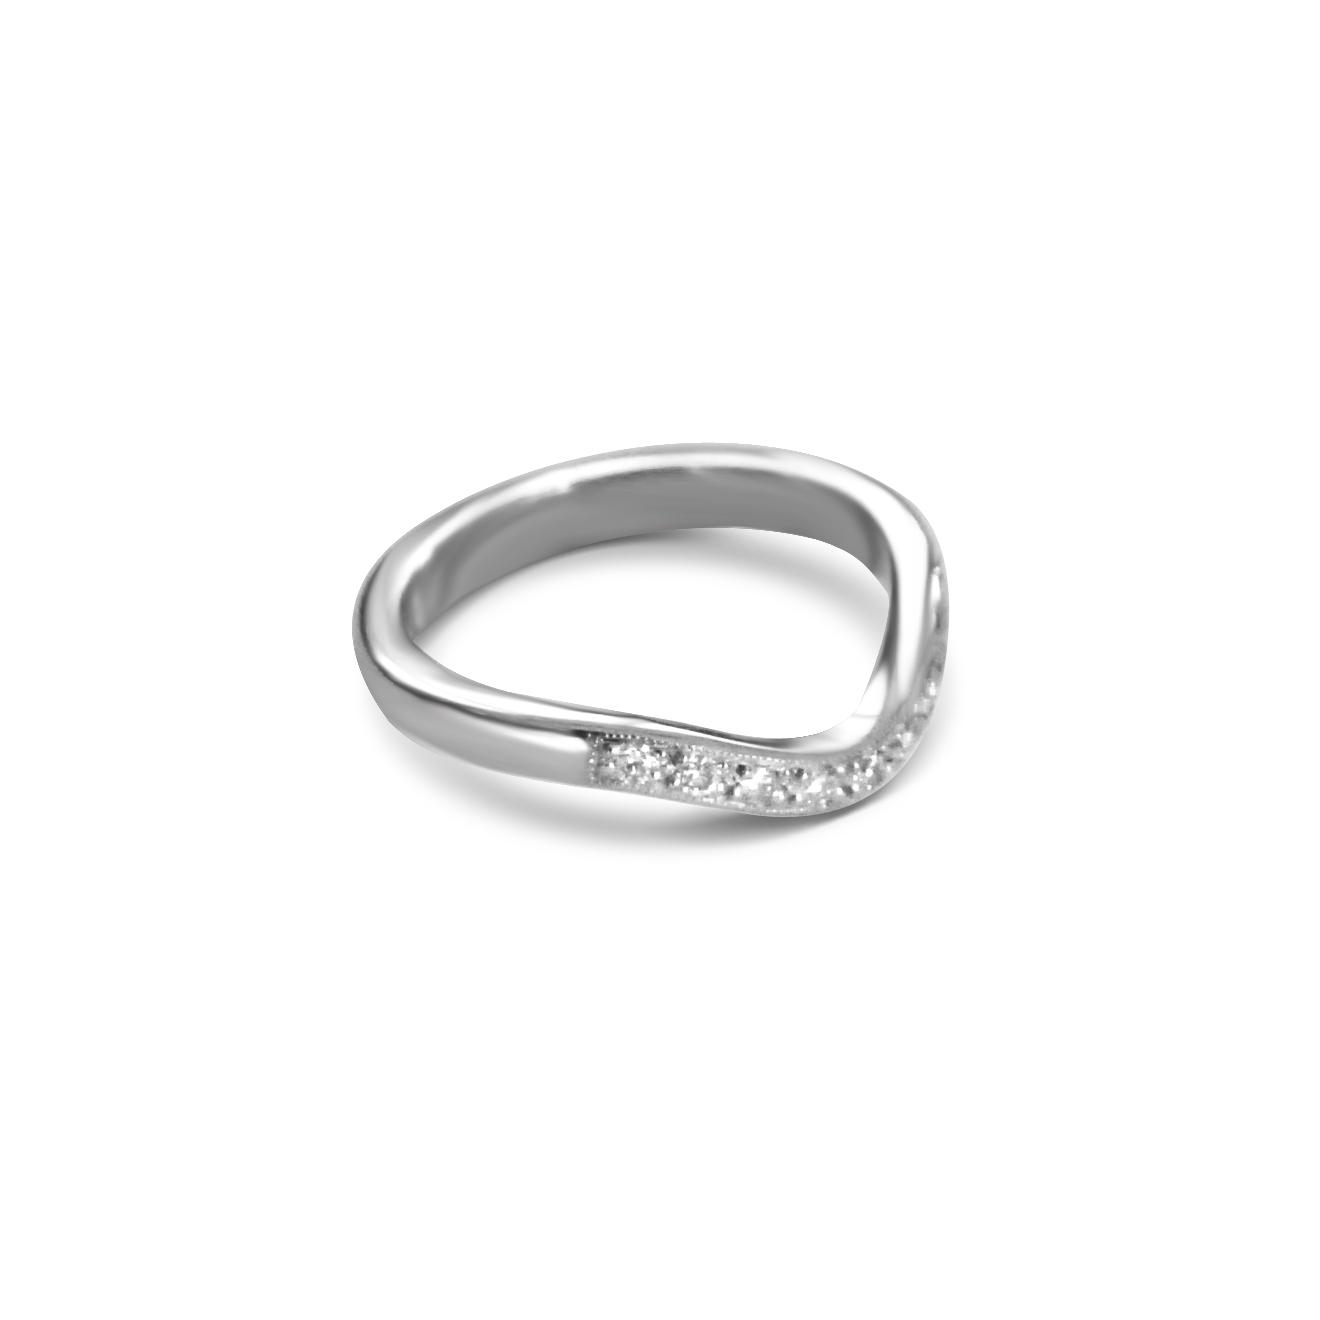 Bespoke Diamond Wedding Ring